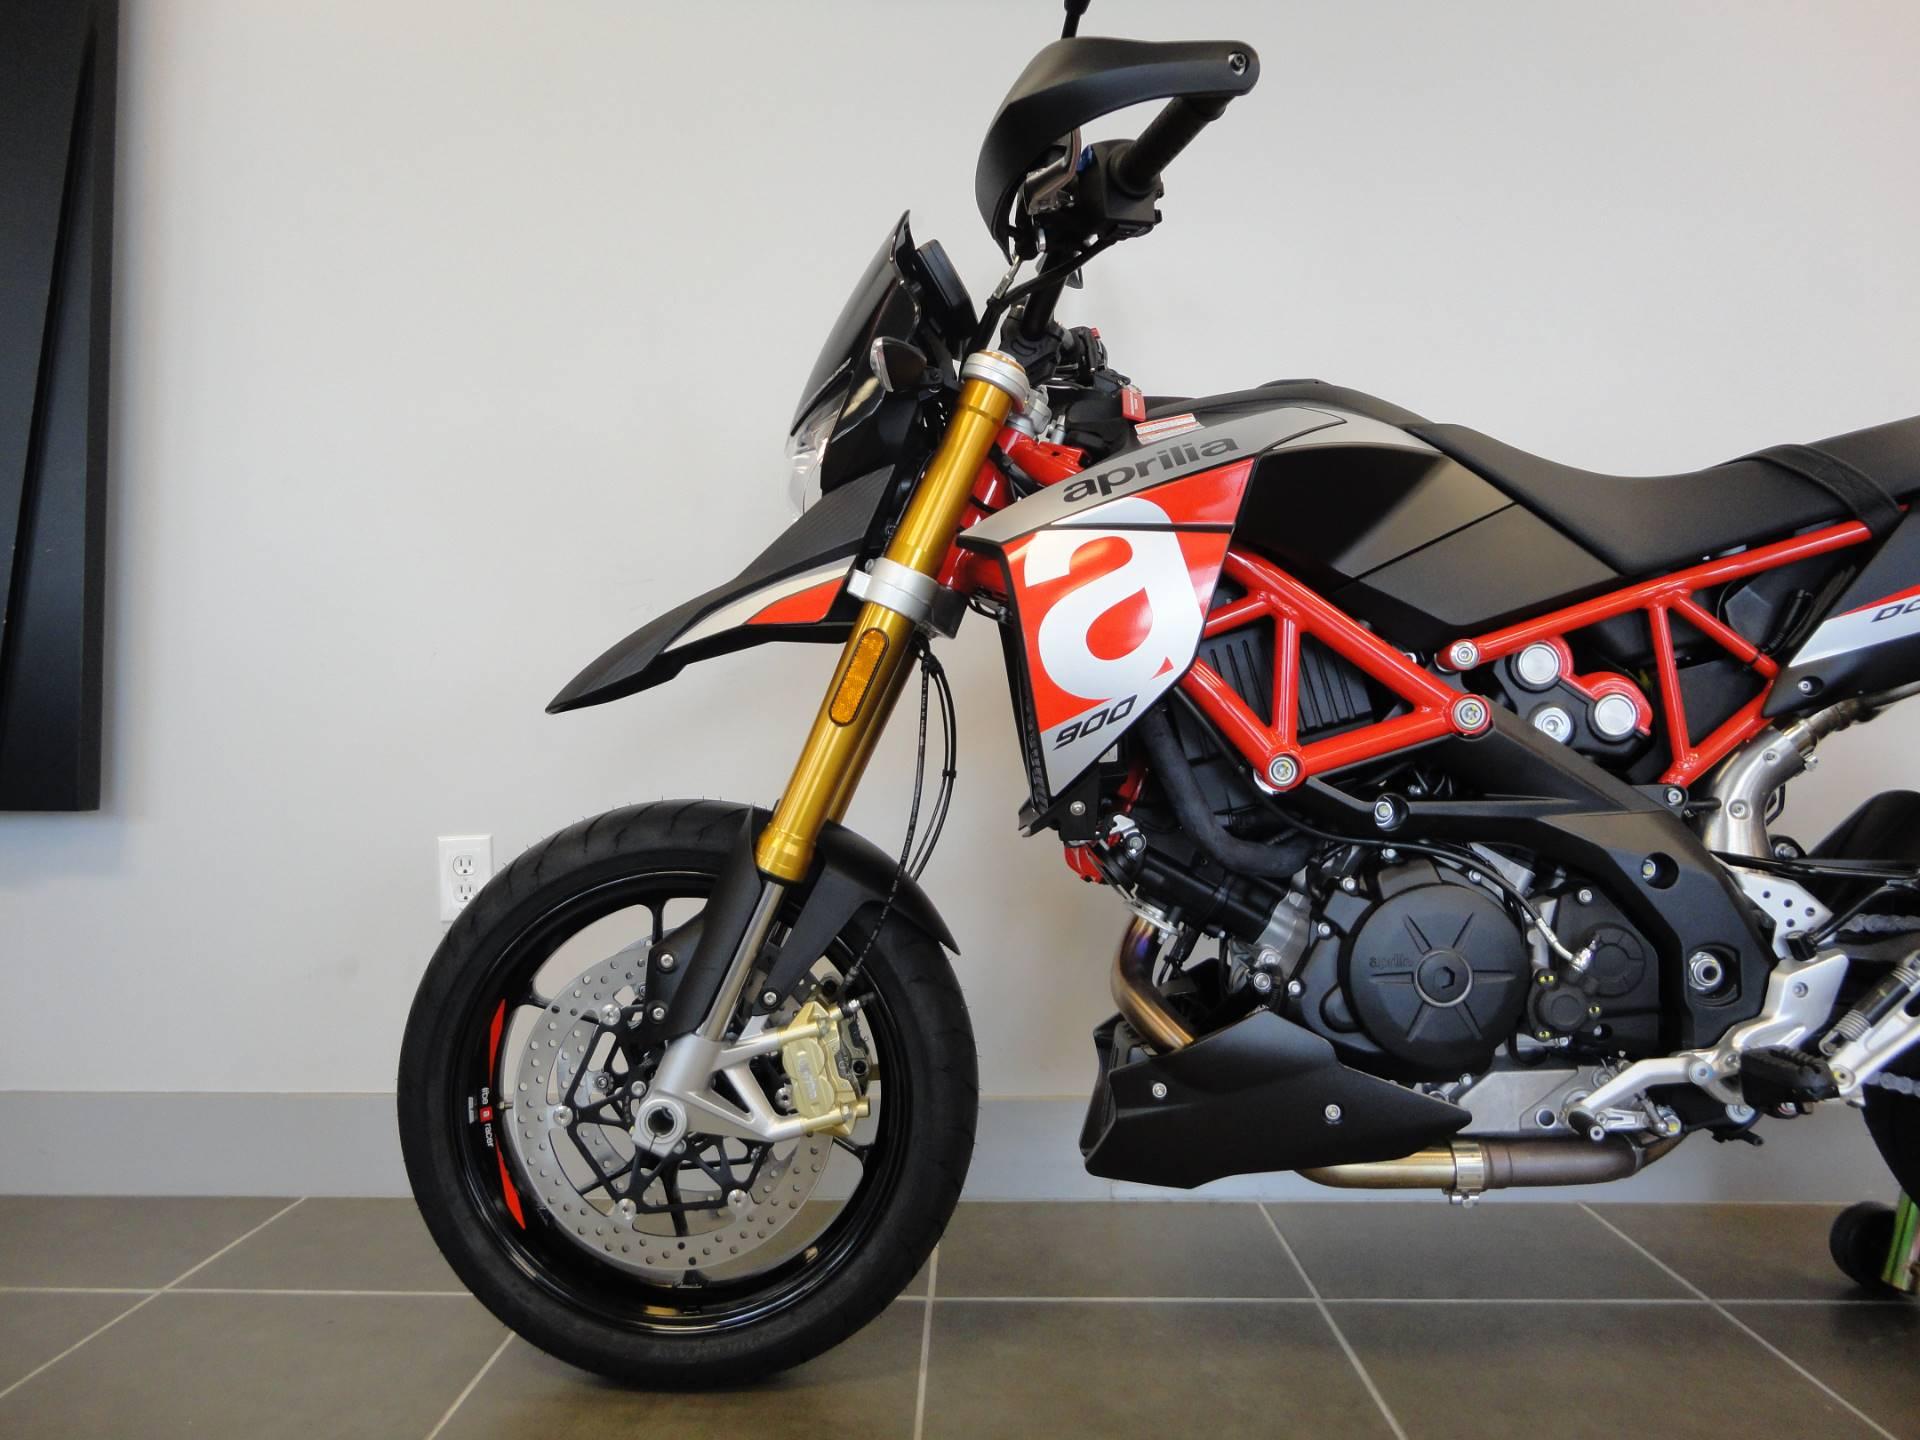 new 2018 aprilia dorsoduro 900 motorcycles in houston tx stock number apr000042. Black Bedroom Furniture Sets. Home Design Ideas